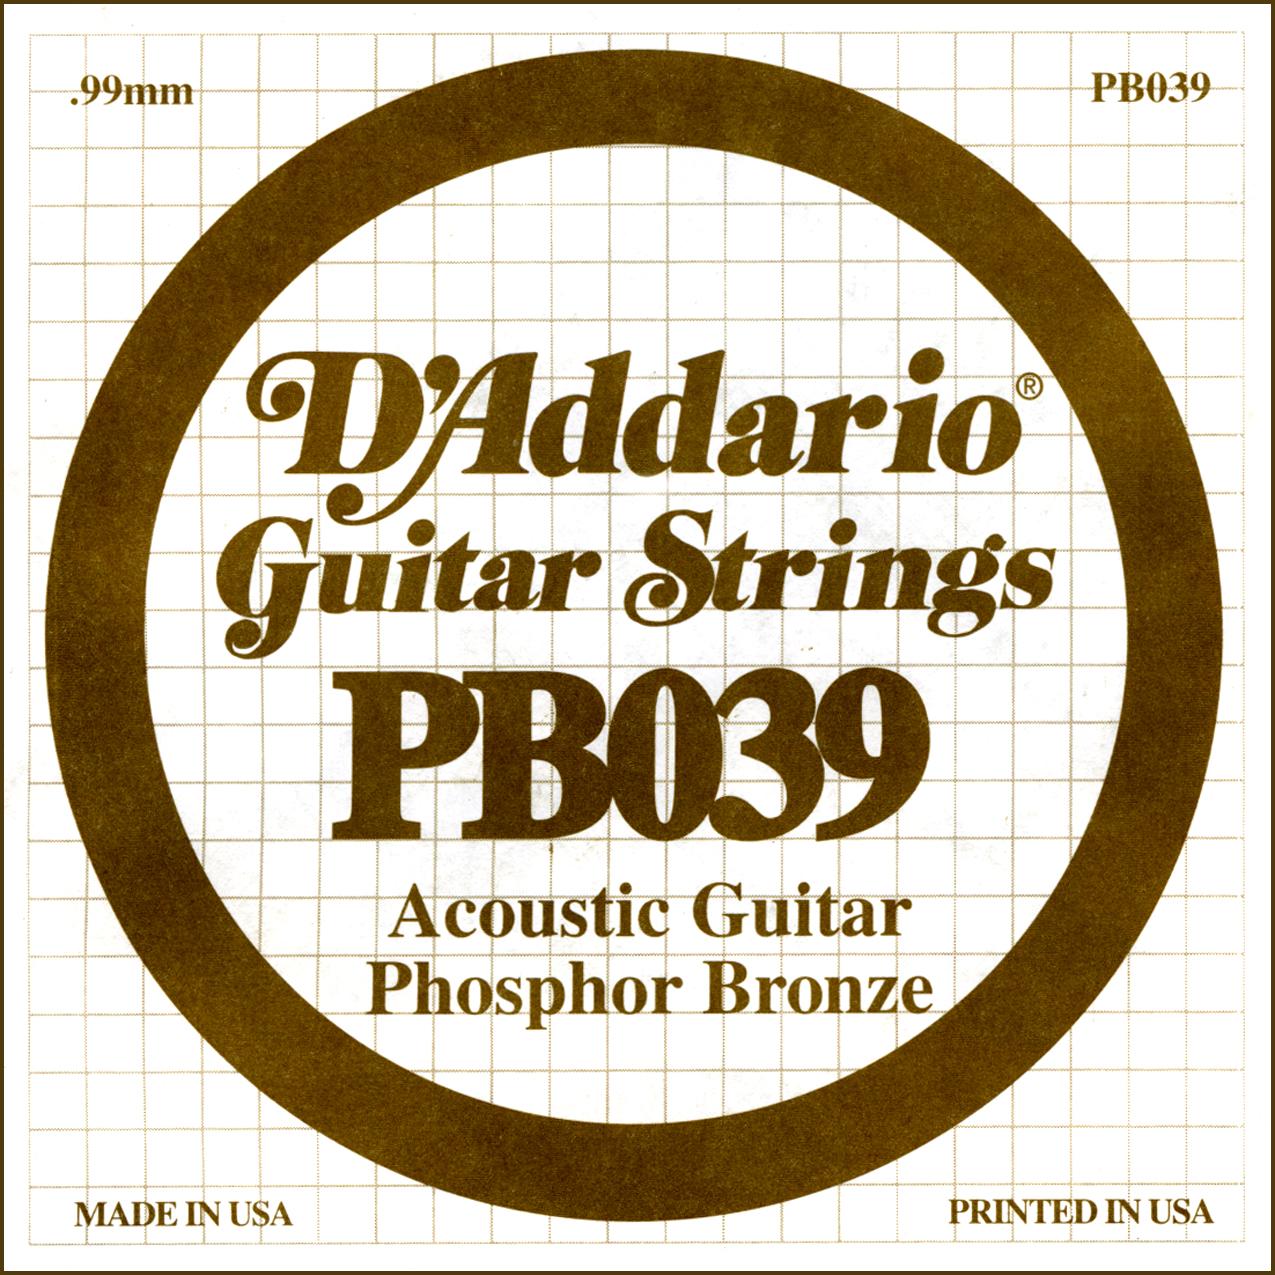 D'Addario Single Strings PBO42